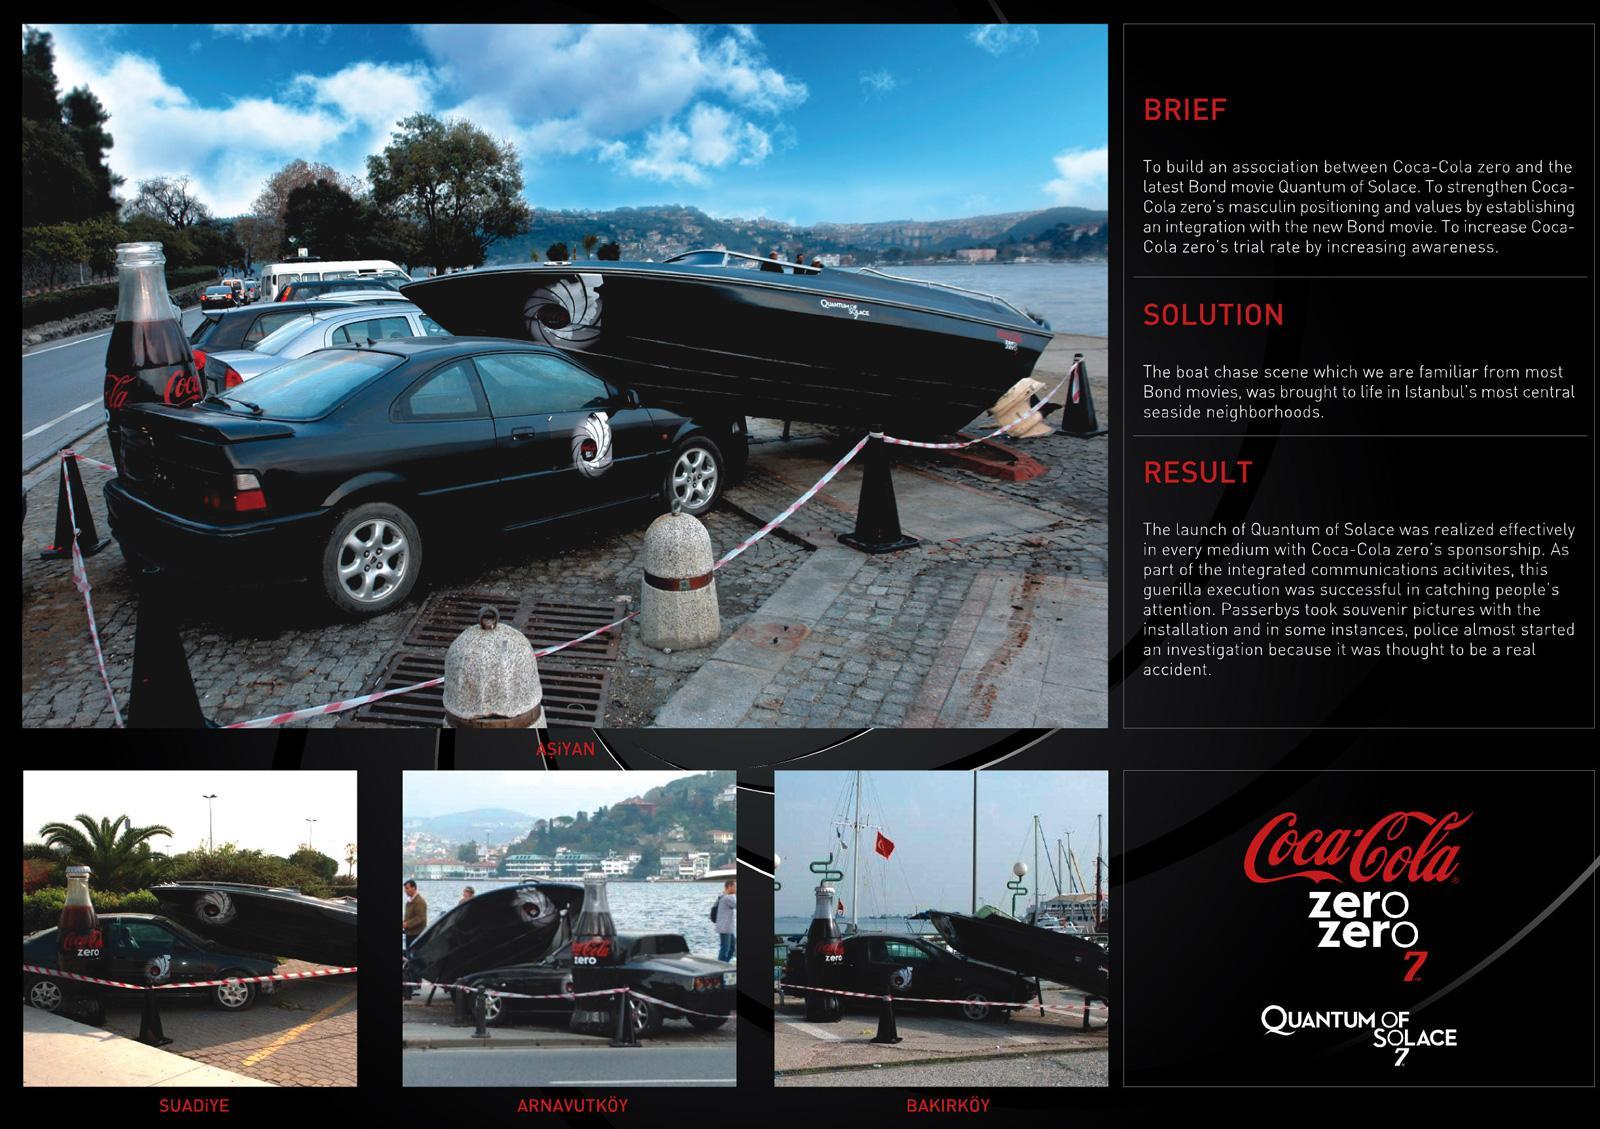 Coca-Cola Zero Ambient Ad -  Boat Accident